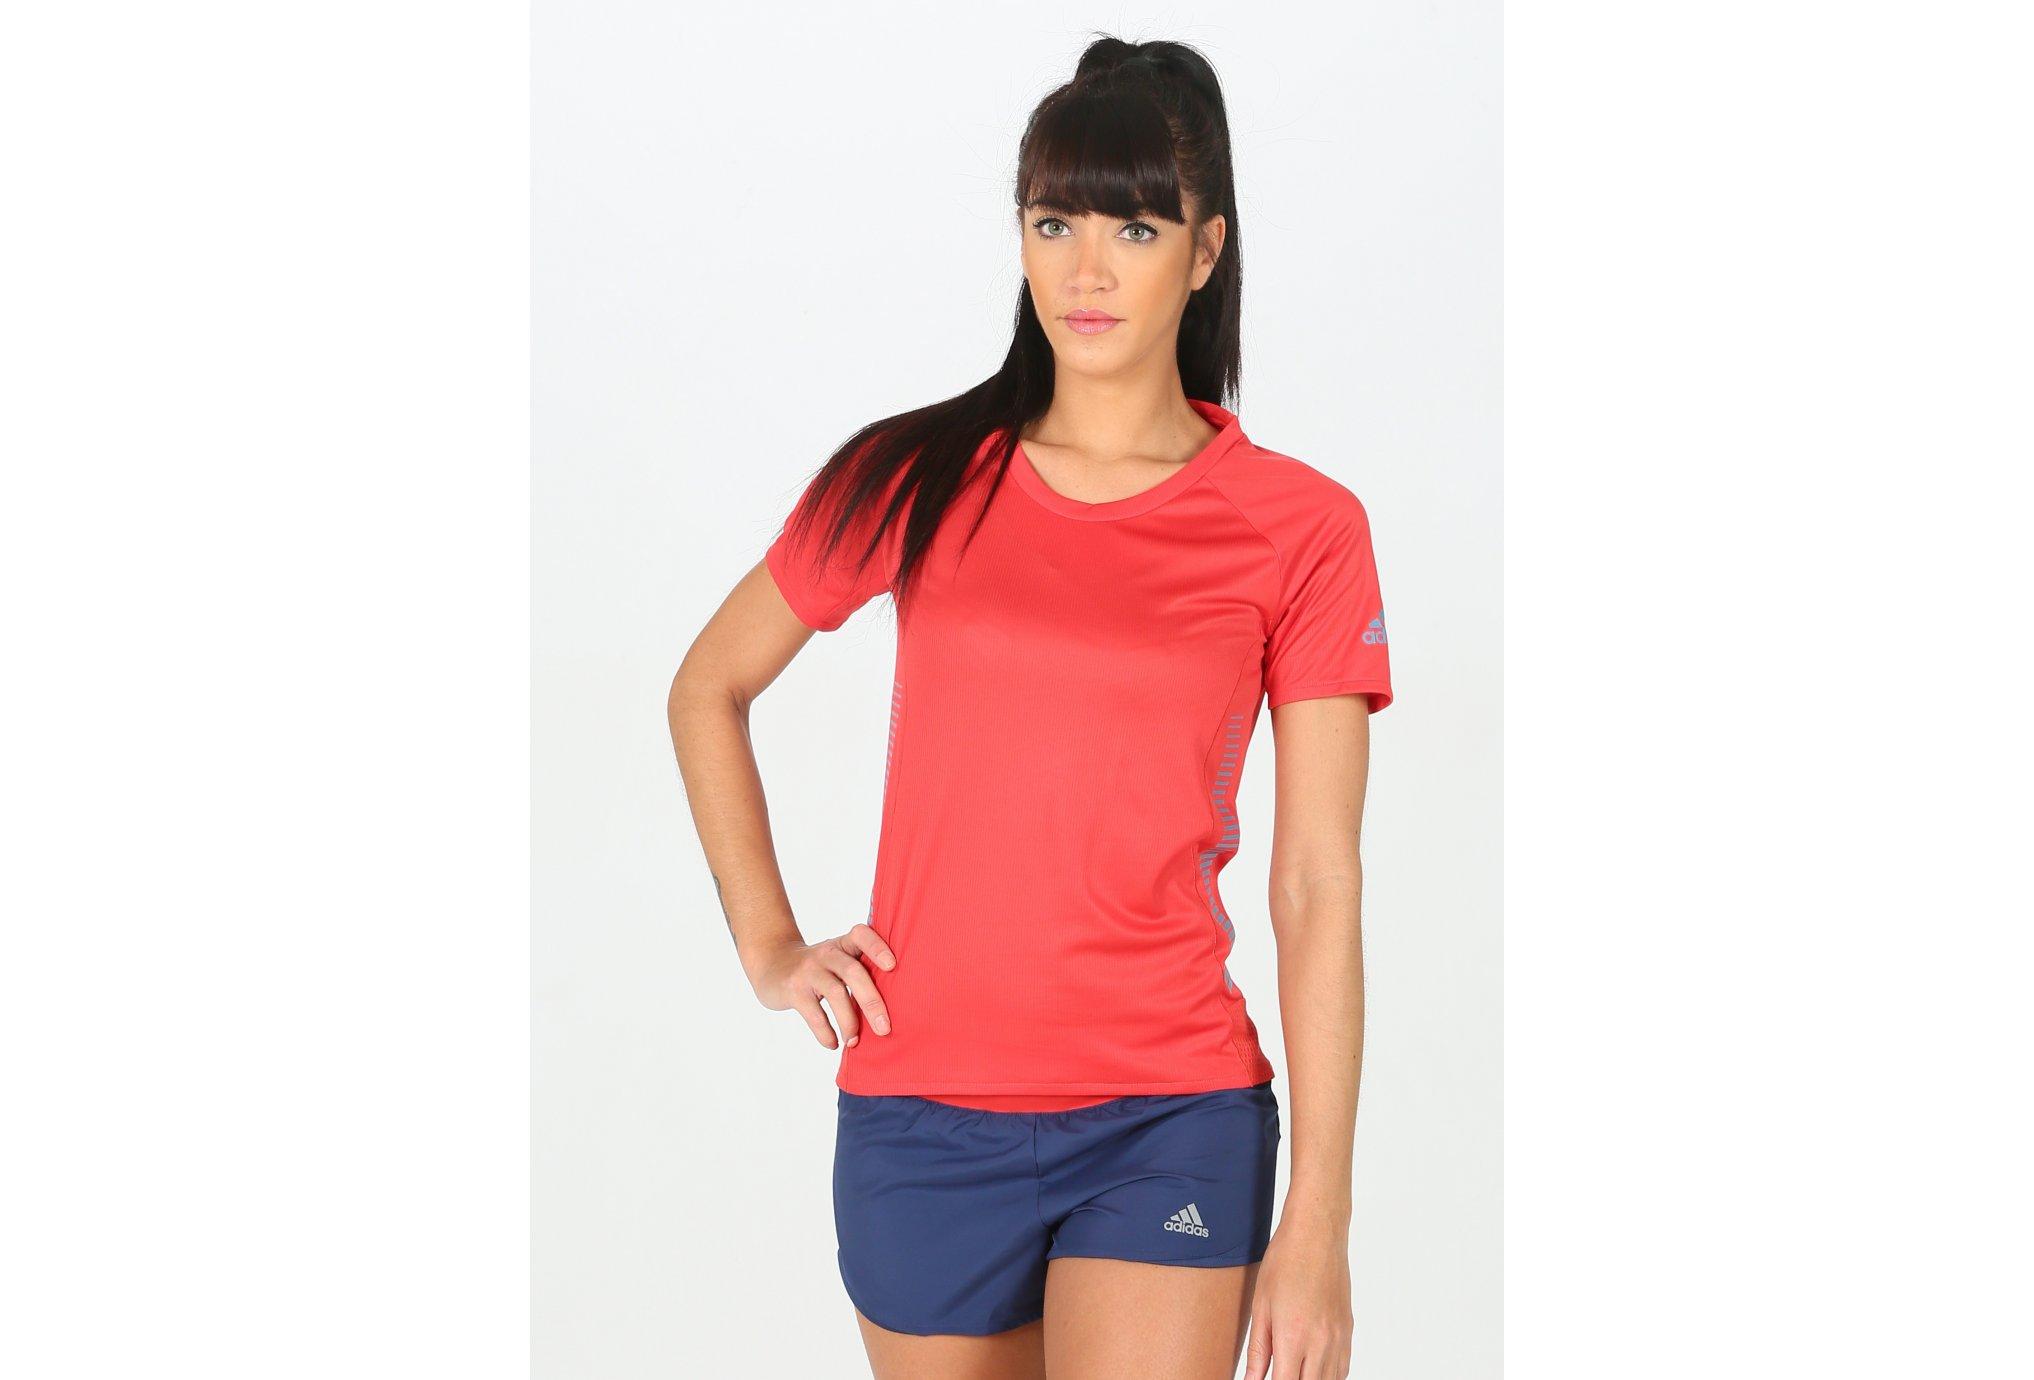 adidas 25/7 Rise Up N Run Parley W vêtement running femme